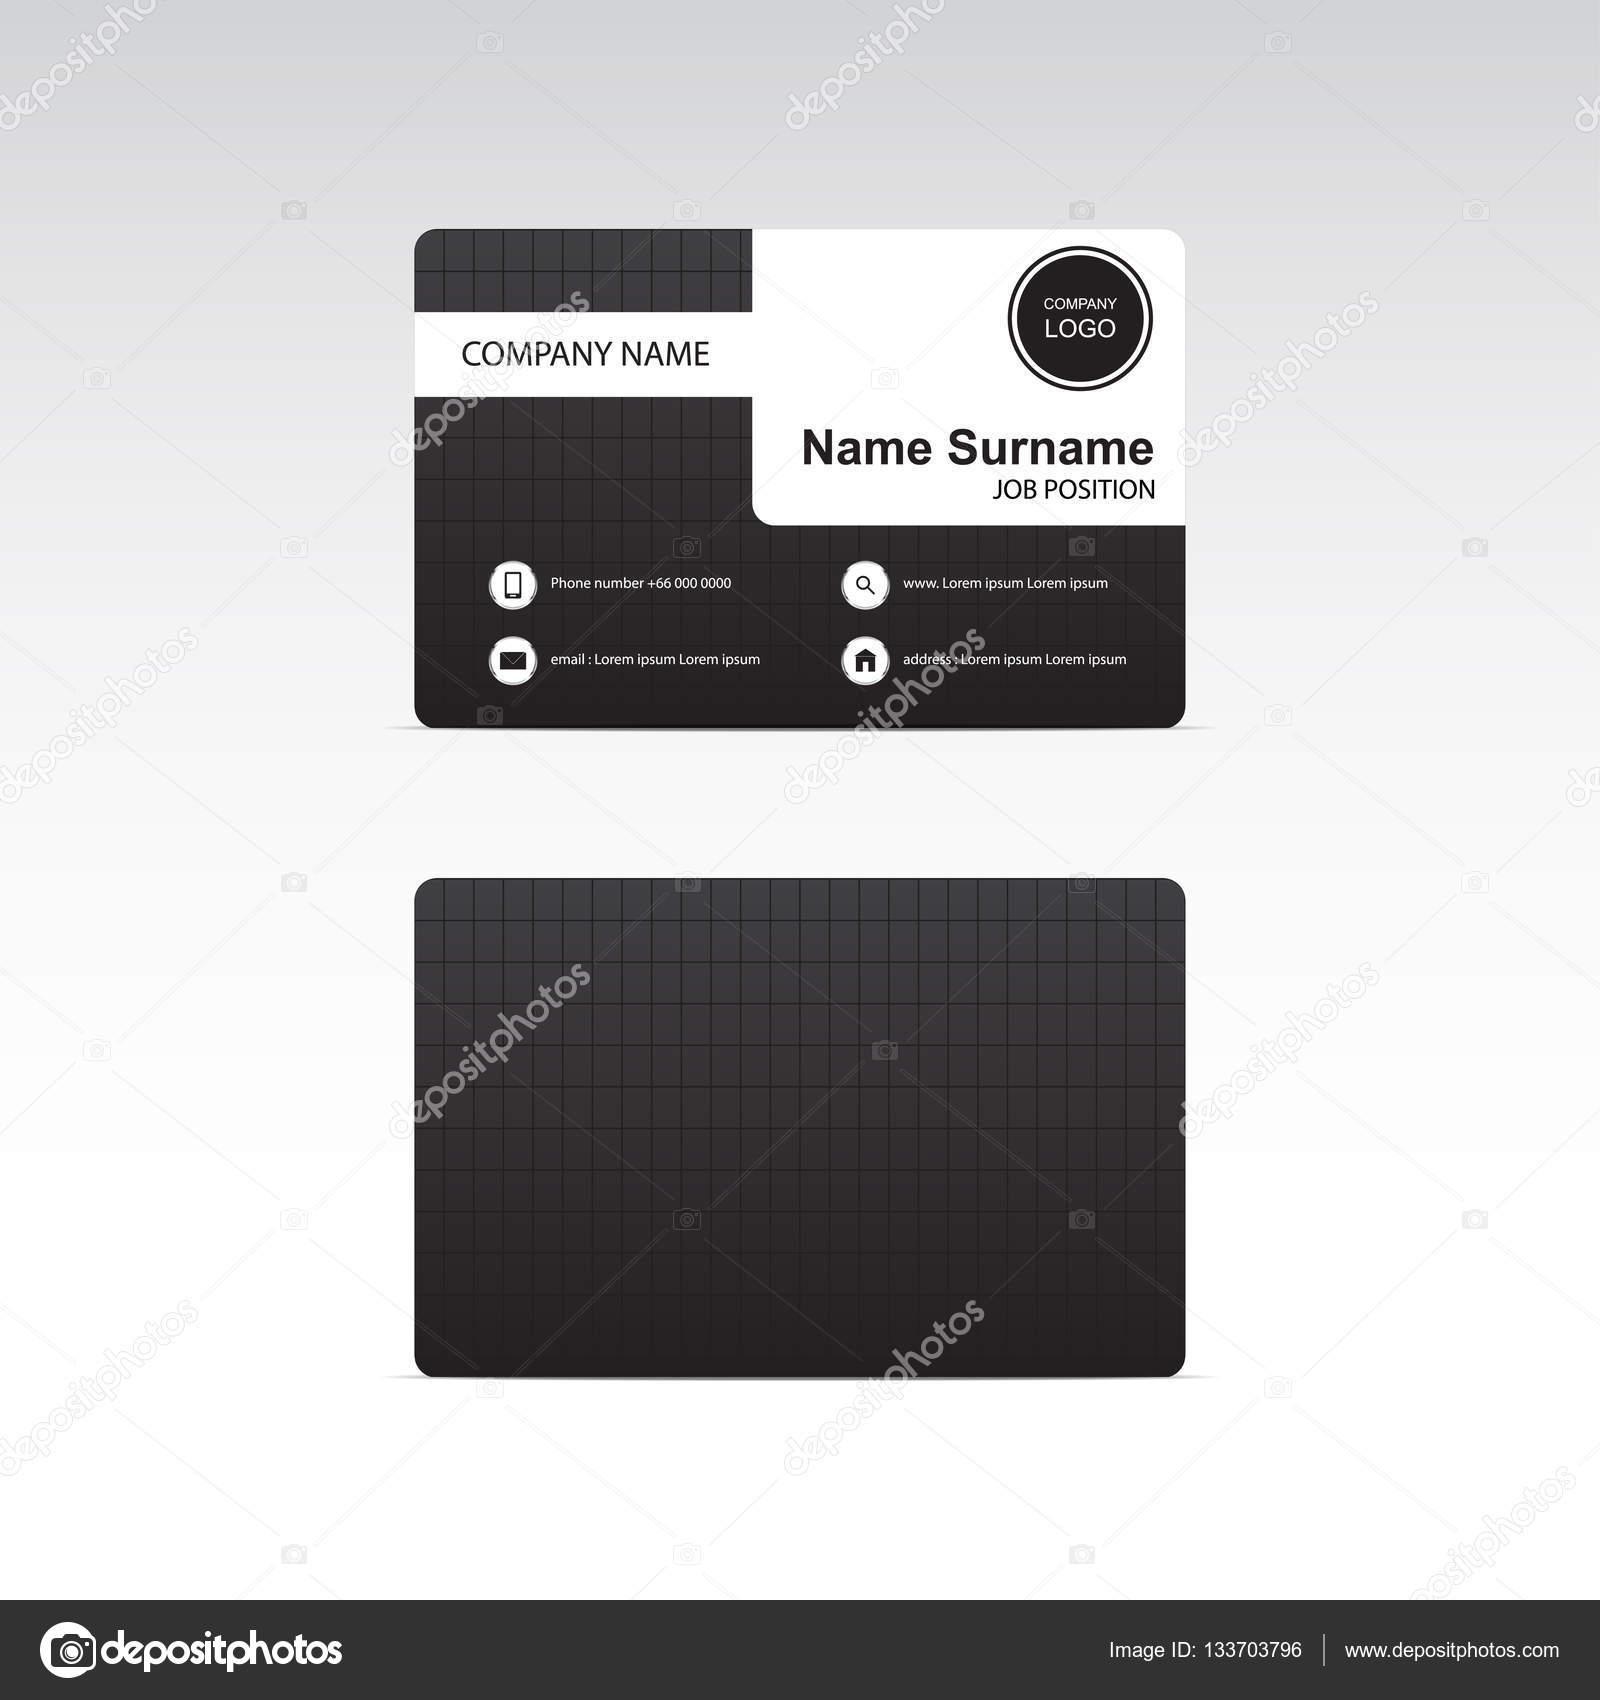 Business card black theme vector design stock vector pitsanu business card black theme vector design stock vector reheart Choice Image